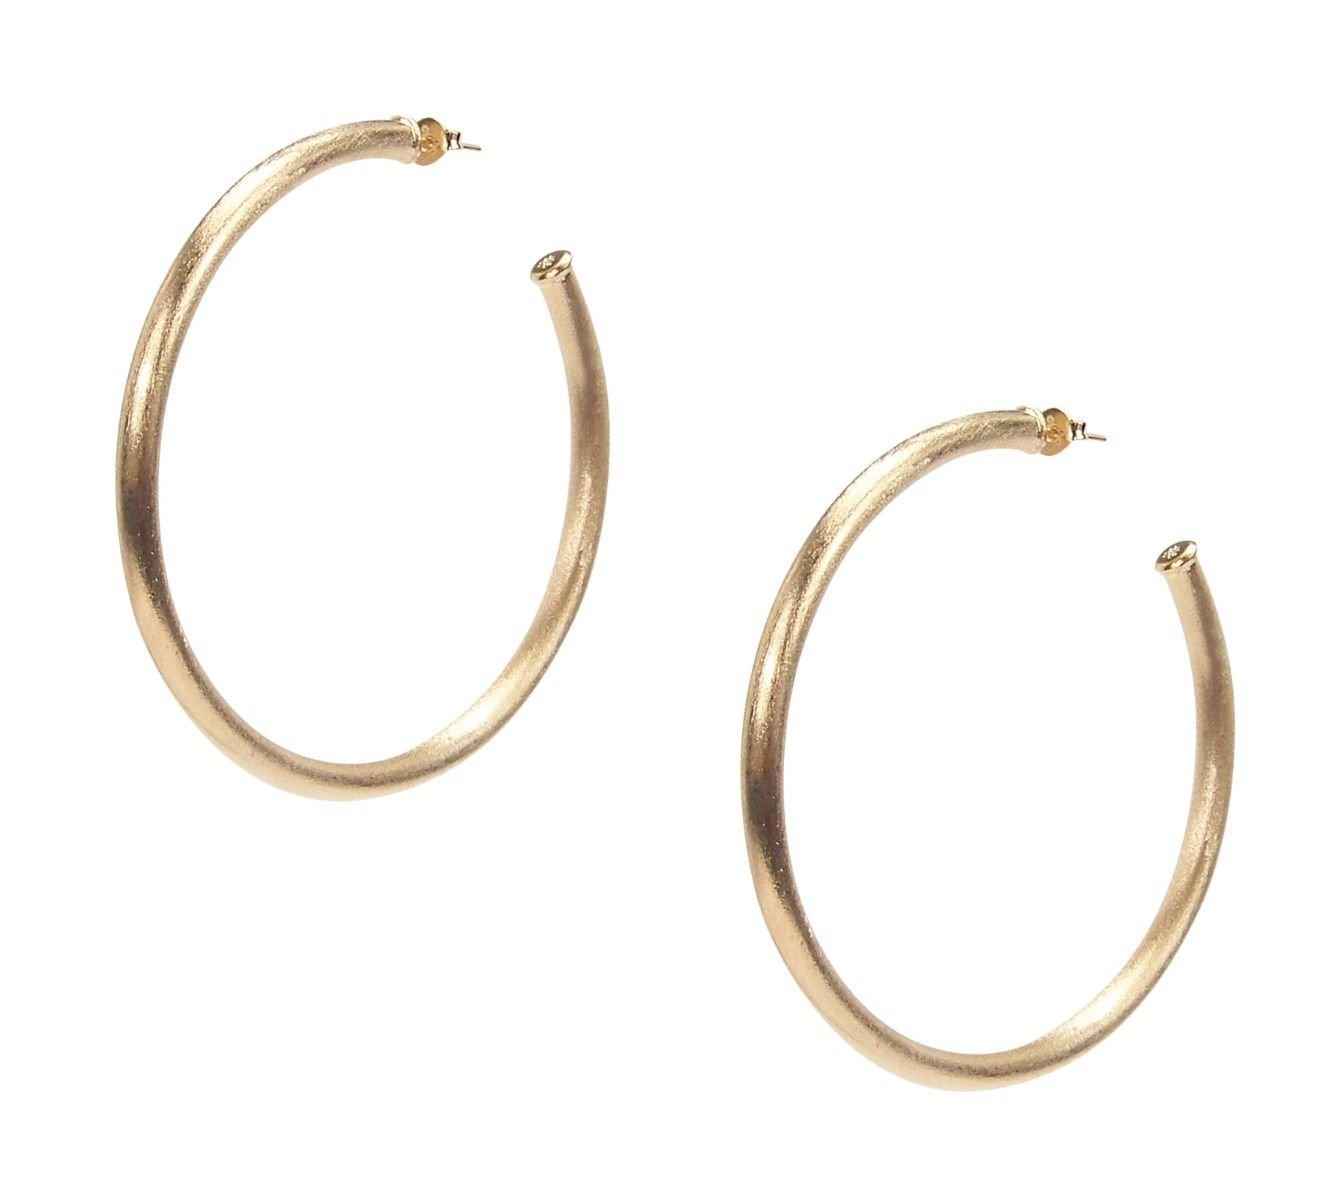 Sheila Fajl Everybody's Favorite 2.25'' Tubular Hoop Earrings in Brush Champagne